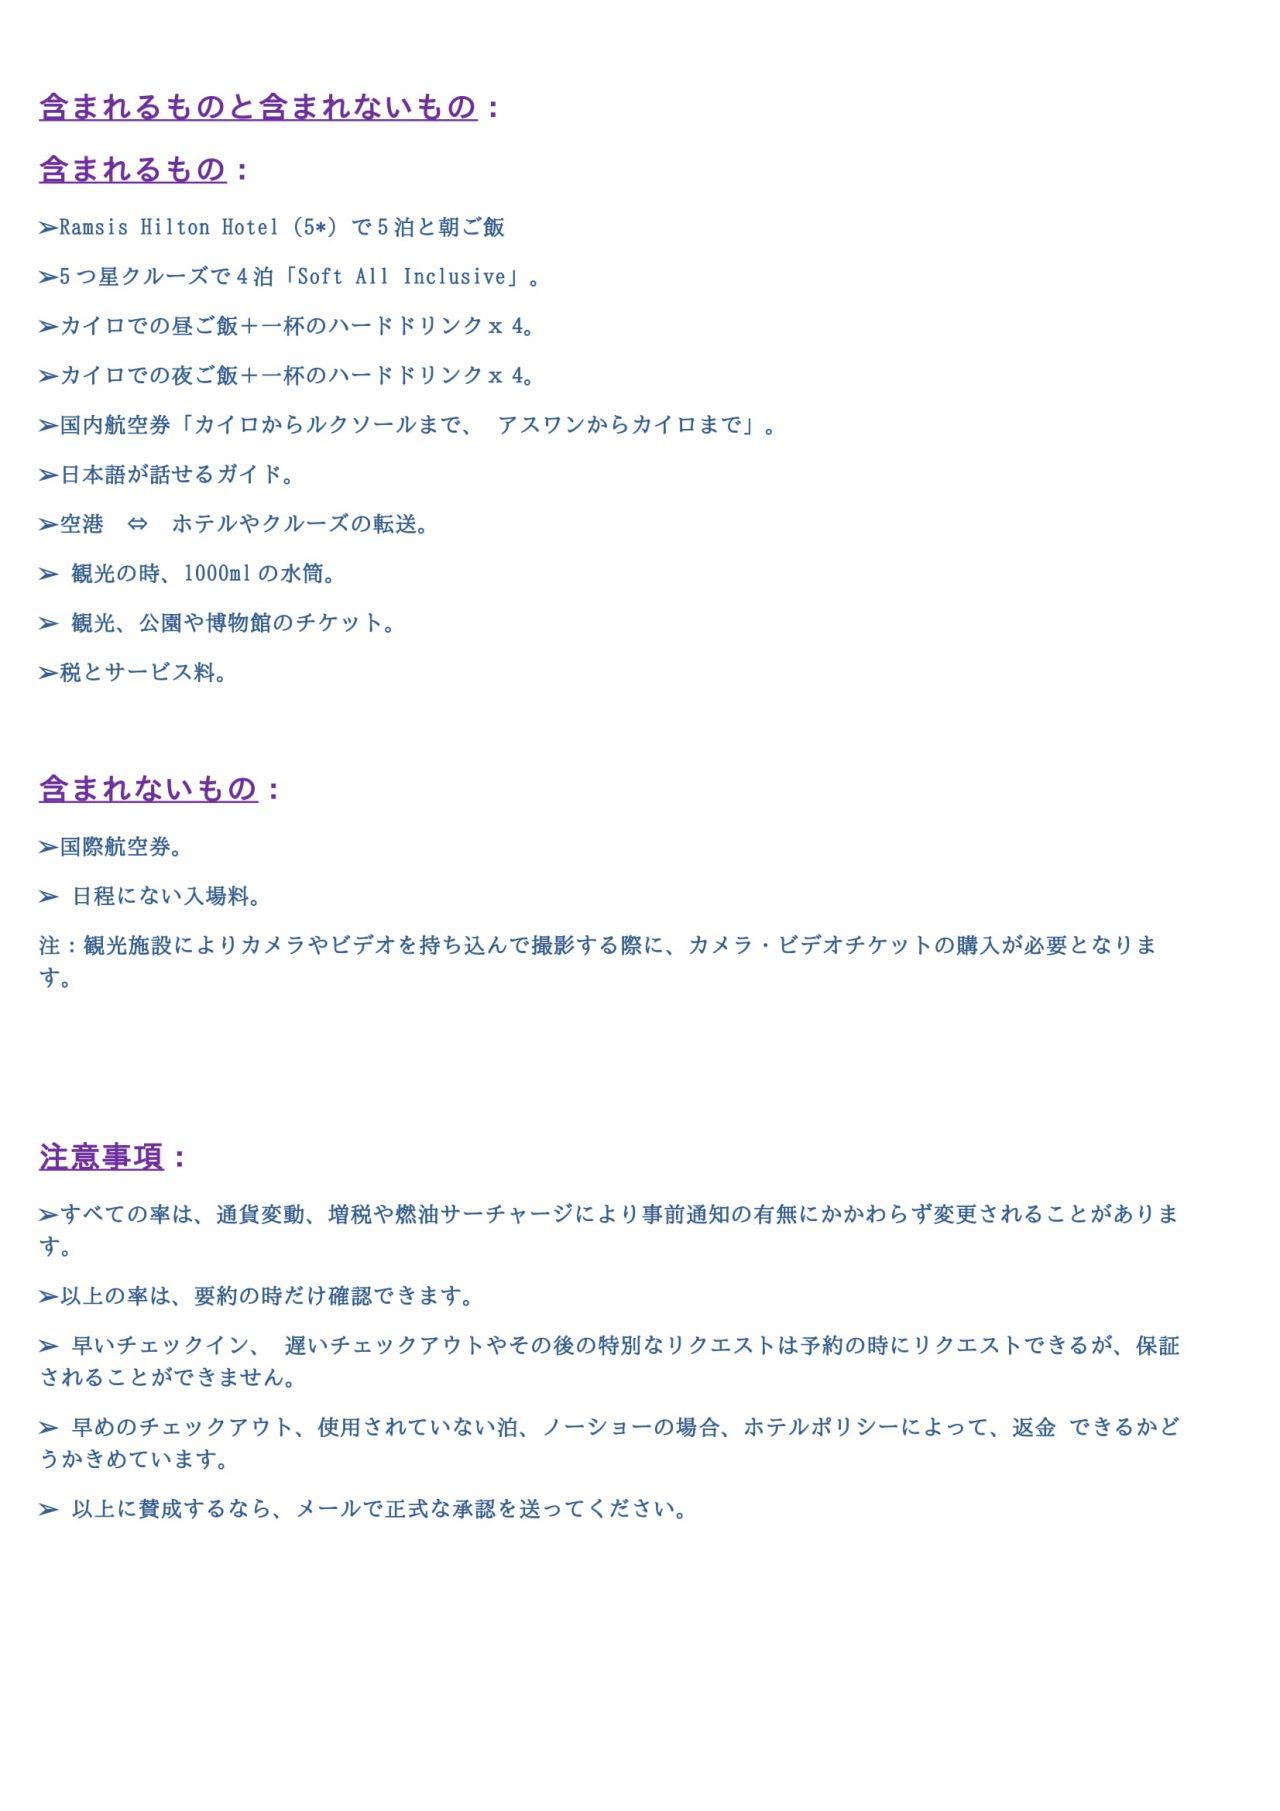 https://traveda.net/wp-content/uploads/2019/03/CAIROLUXOR-ASWAN-CRUISEDAY-USE@-ALEXANDRIA-10DAYS-09NIGHTS-Japanese-2-1280x1811.jpg